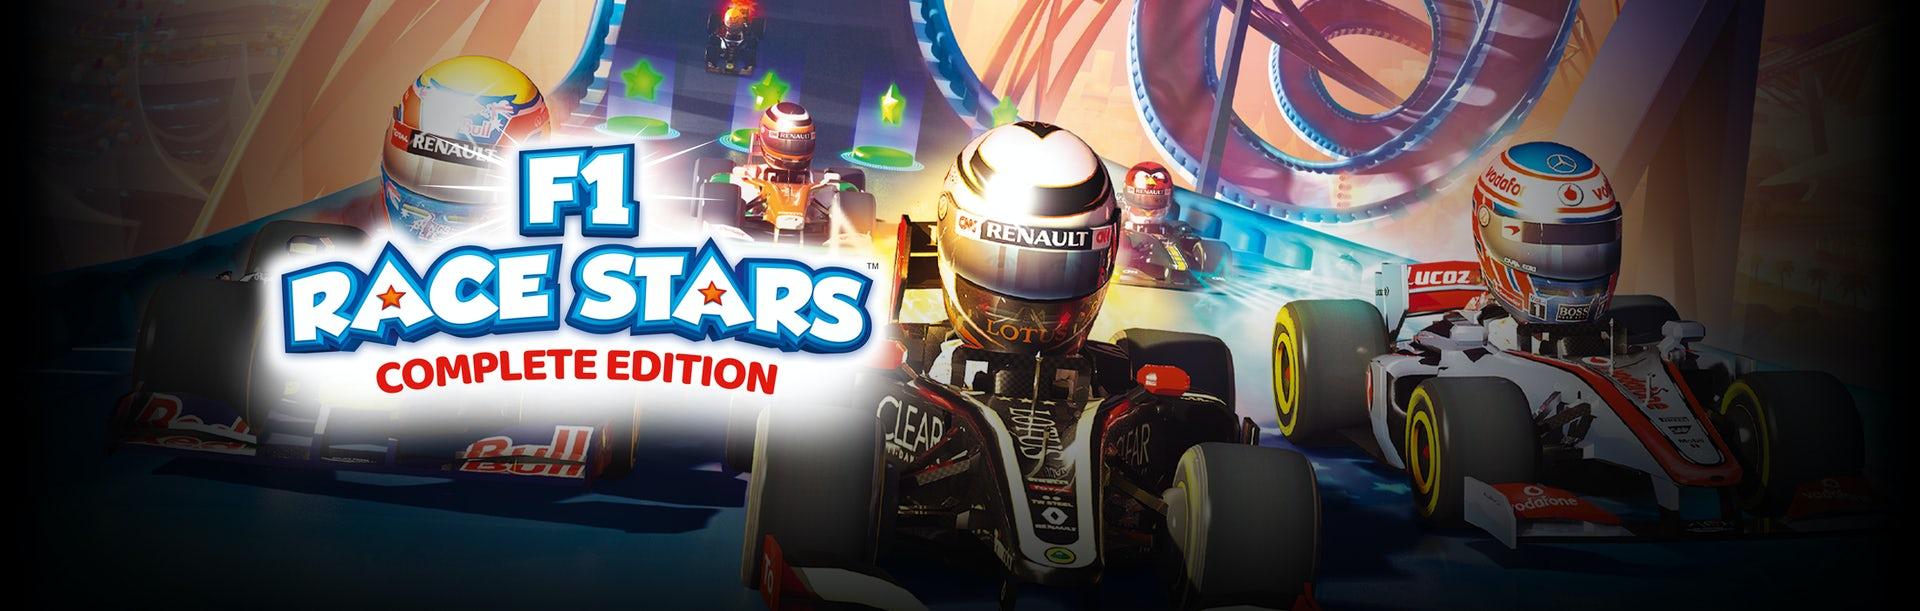 Fanatical [PC]: F1 RACE STARS Complete Edition por 0.69 dólares - MÍNIMO HISTÓRICO y OFERTA FLASH POR 24HRS.